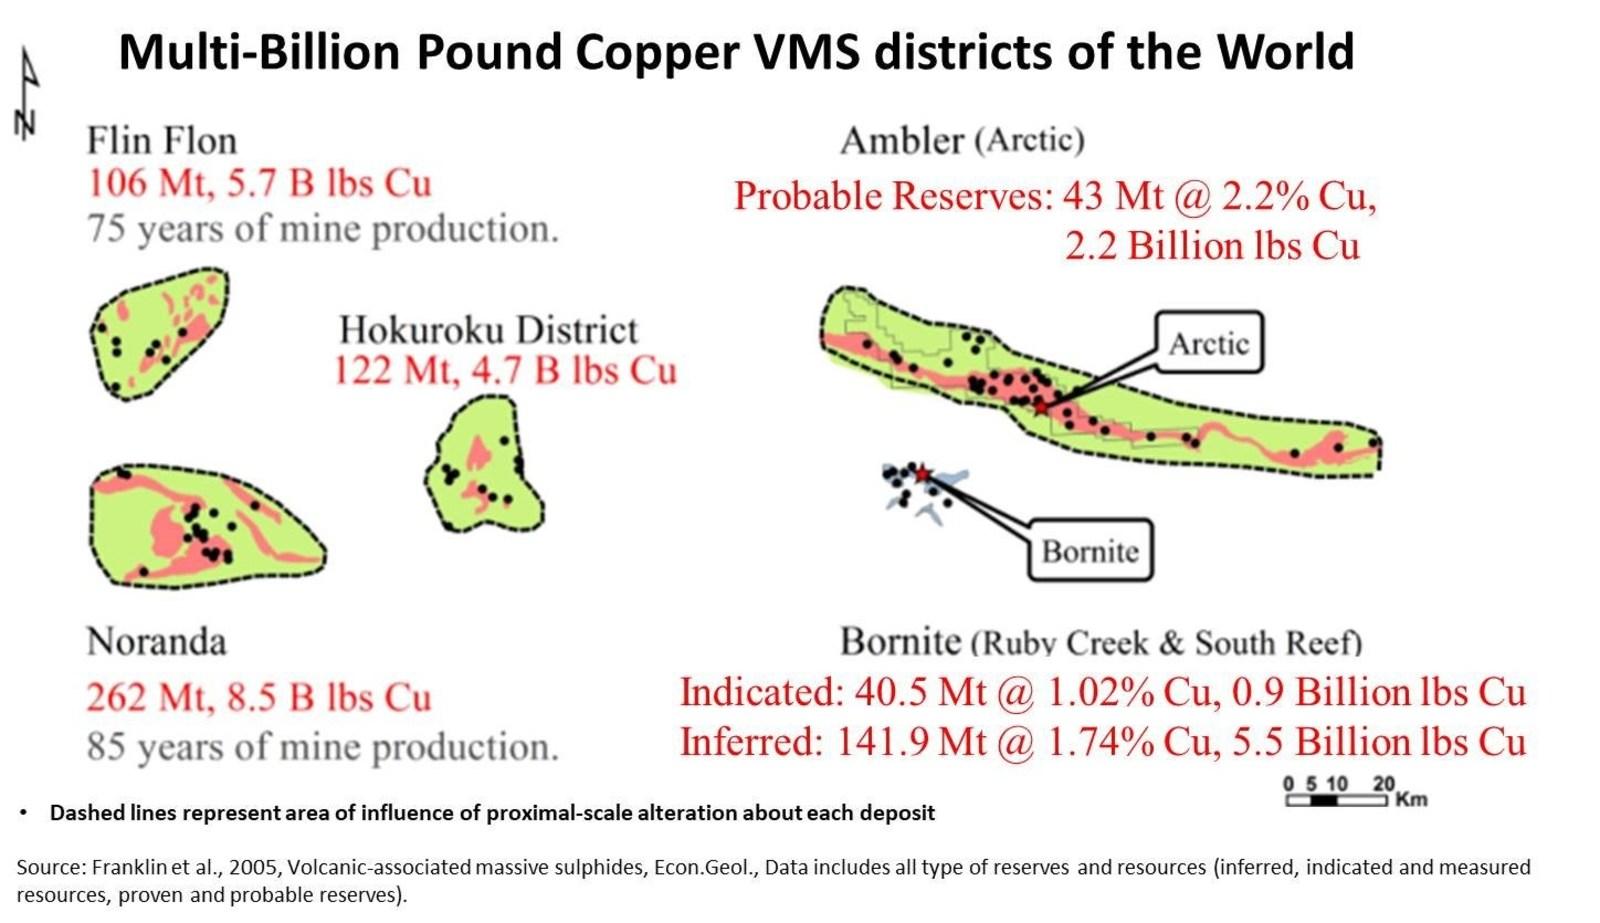 Figure 3. Comparison of the Ambler VMS Belt with other VMS Belts